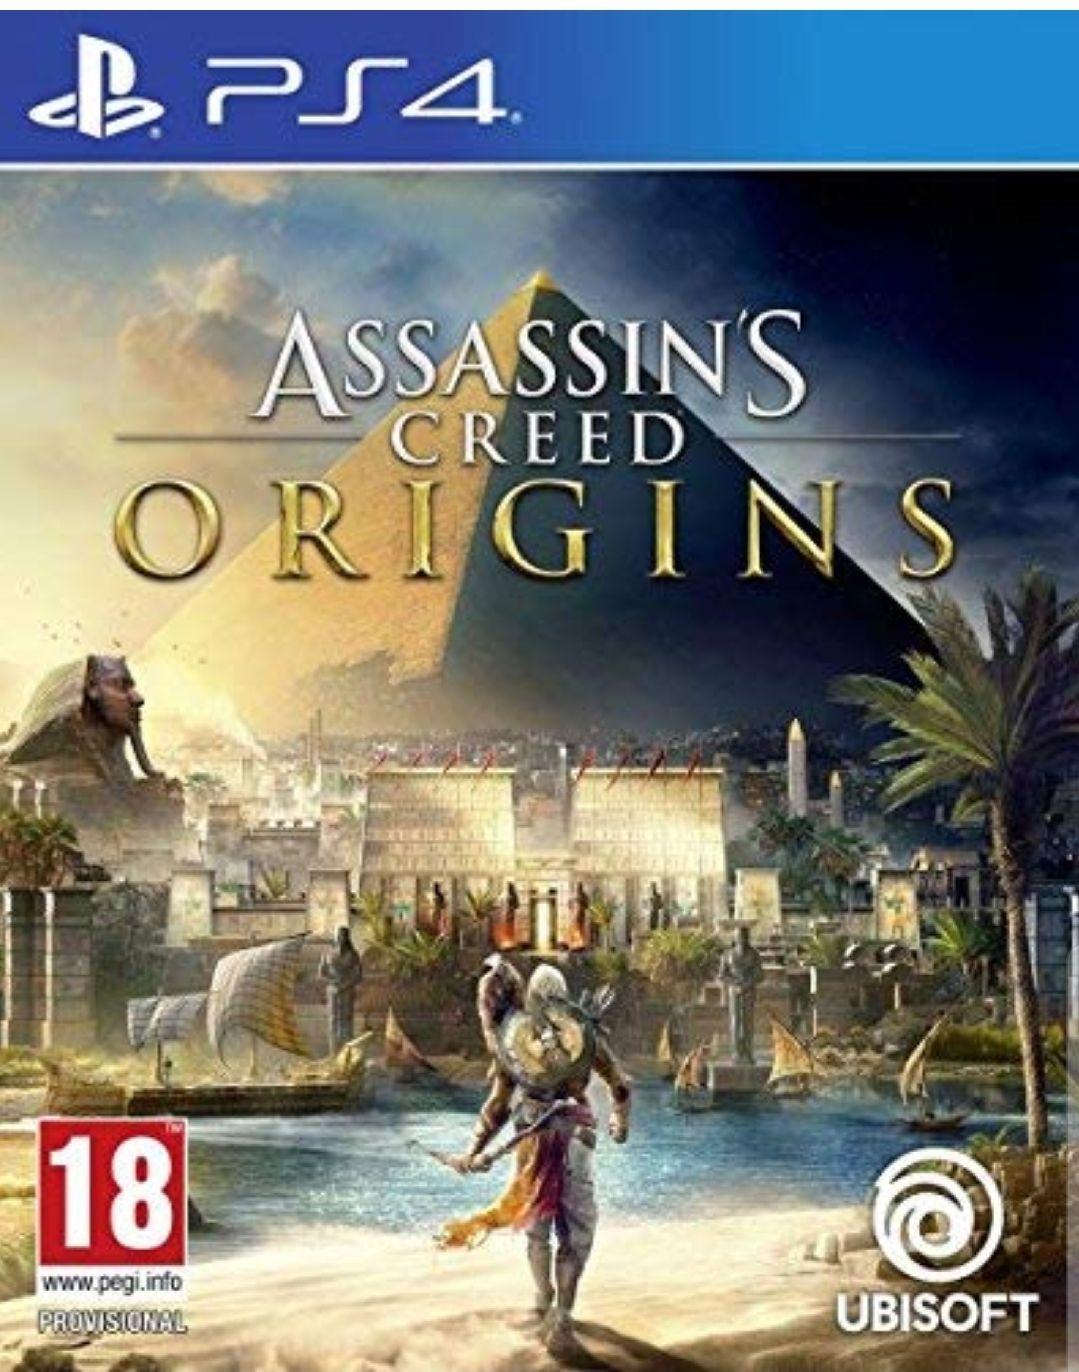 Assassins Creed Origins solo 24.95€!